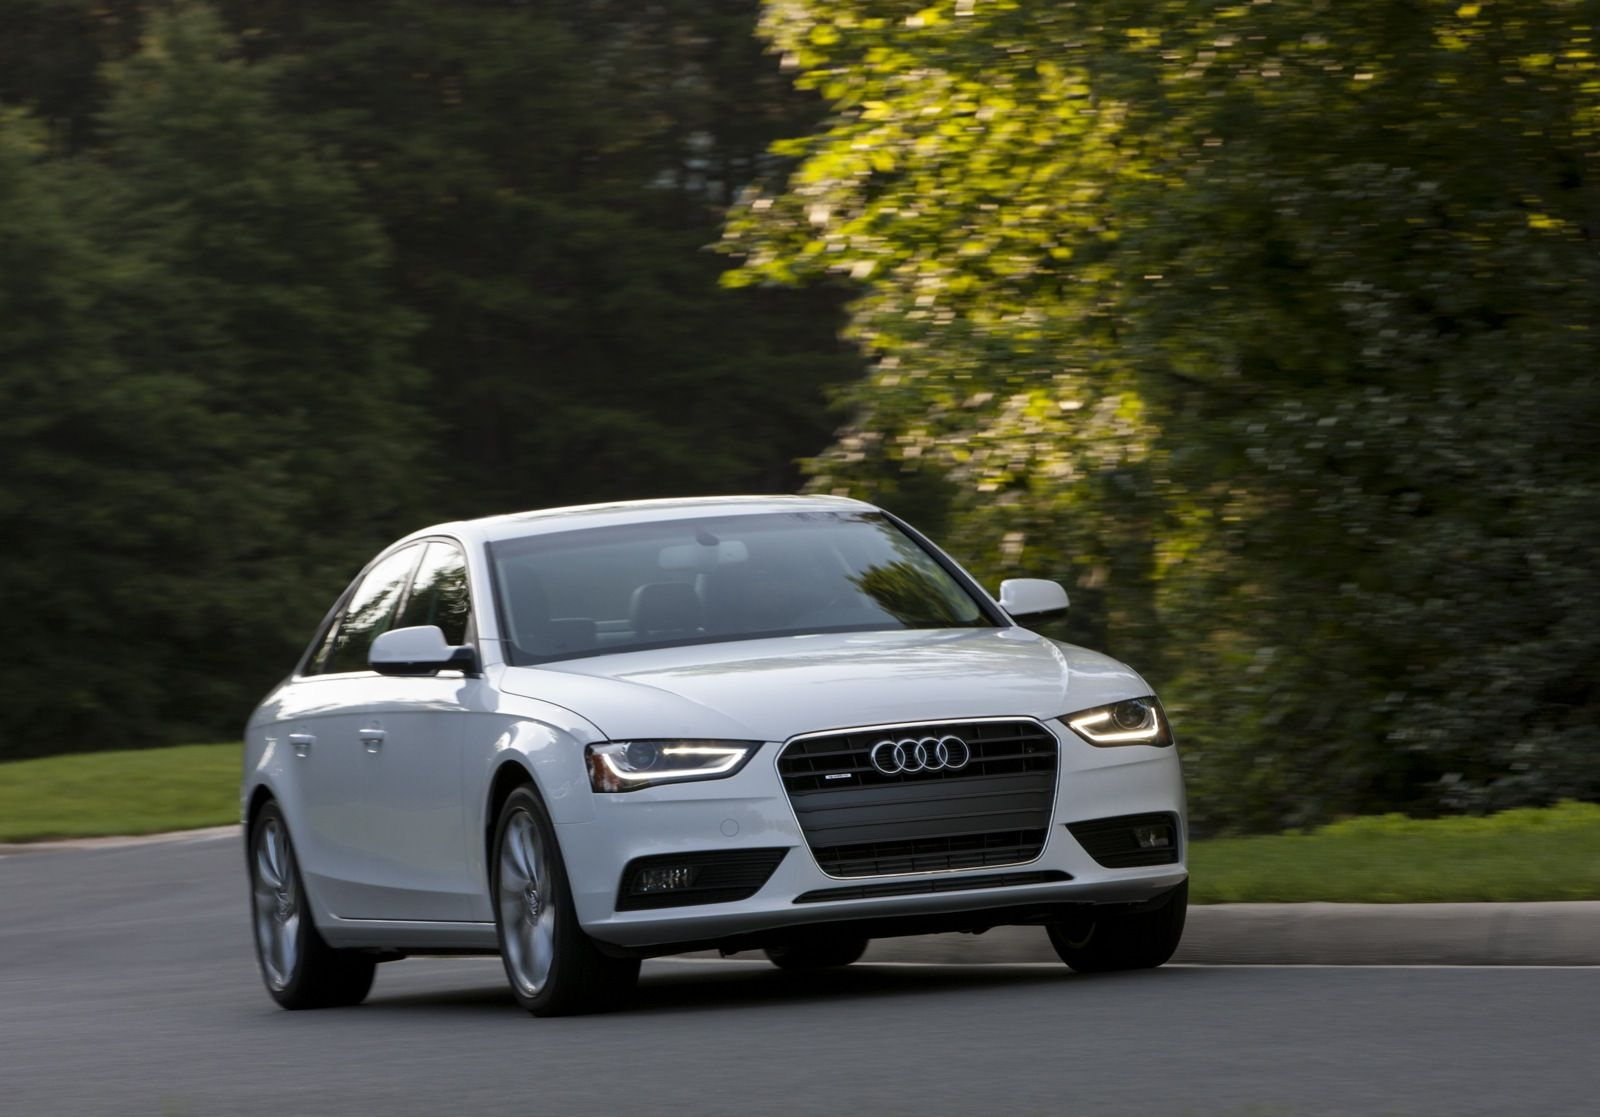 Audi A4 Quattro Fuel Economy In 2020 Audi A4 Audi A4 Quattro Audi